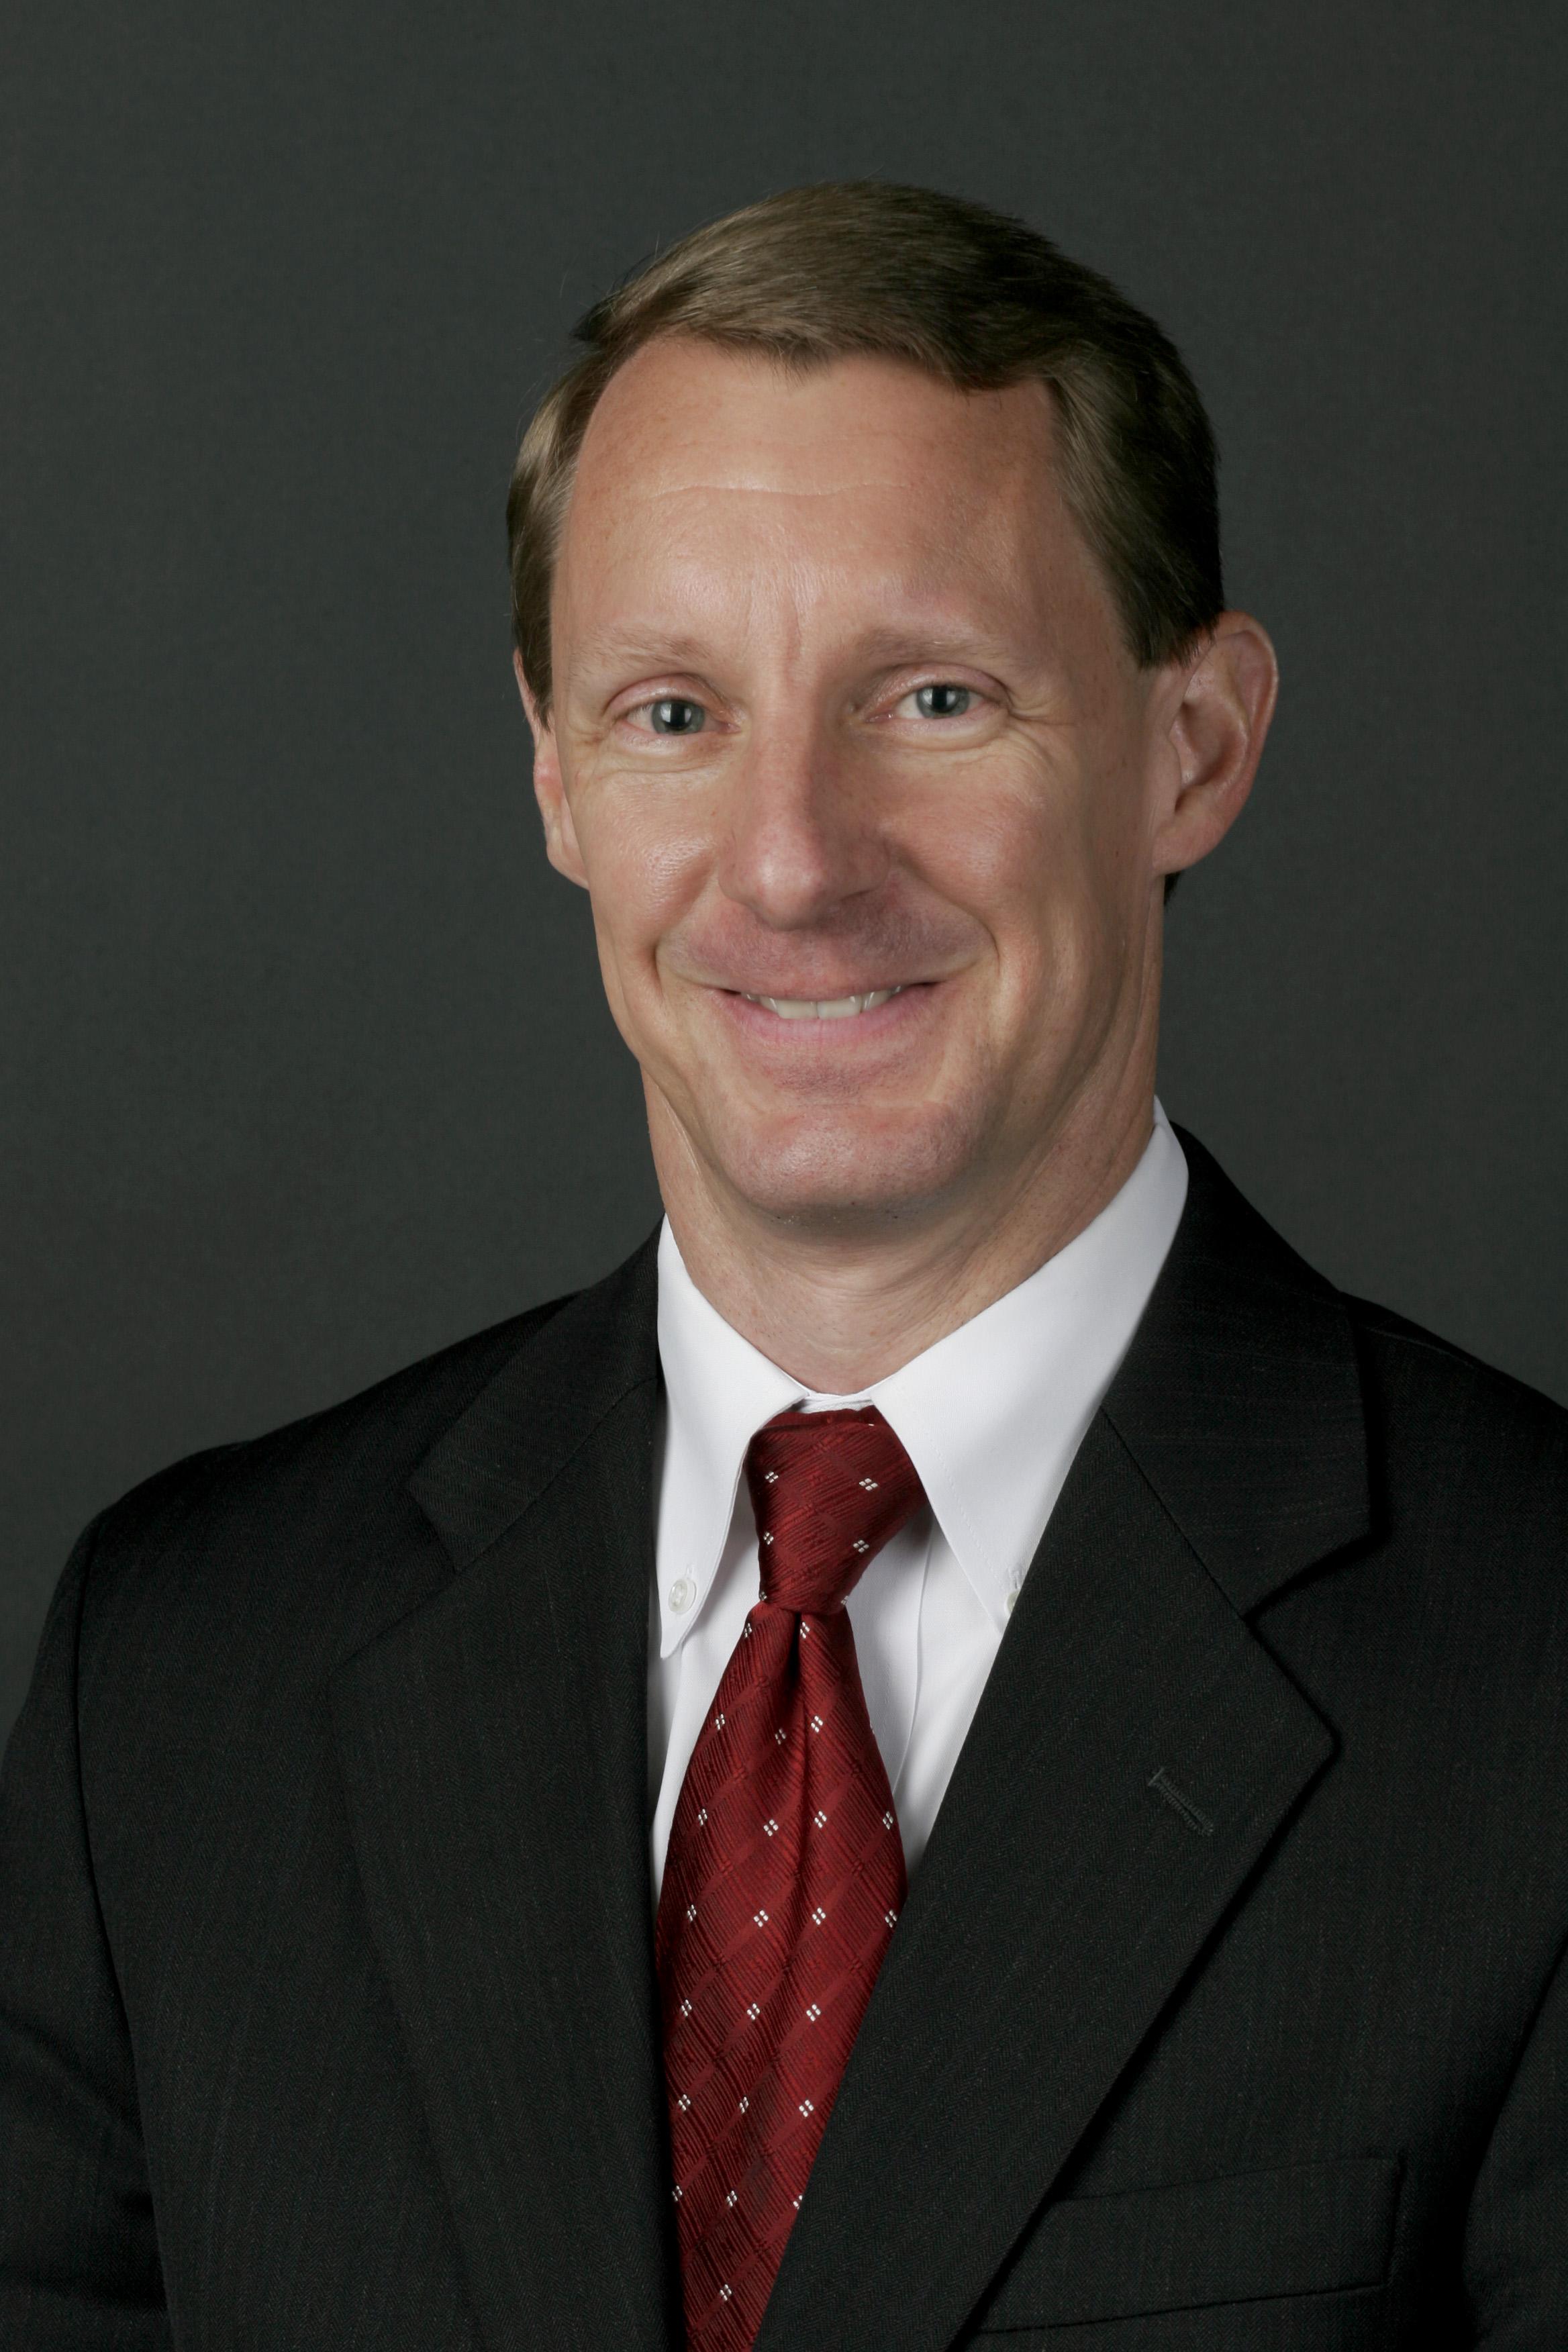 Michael Newton Law Professor